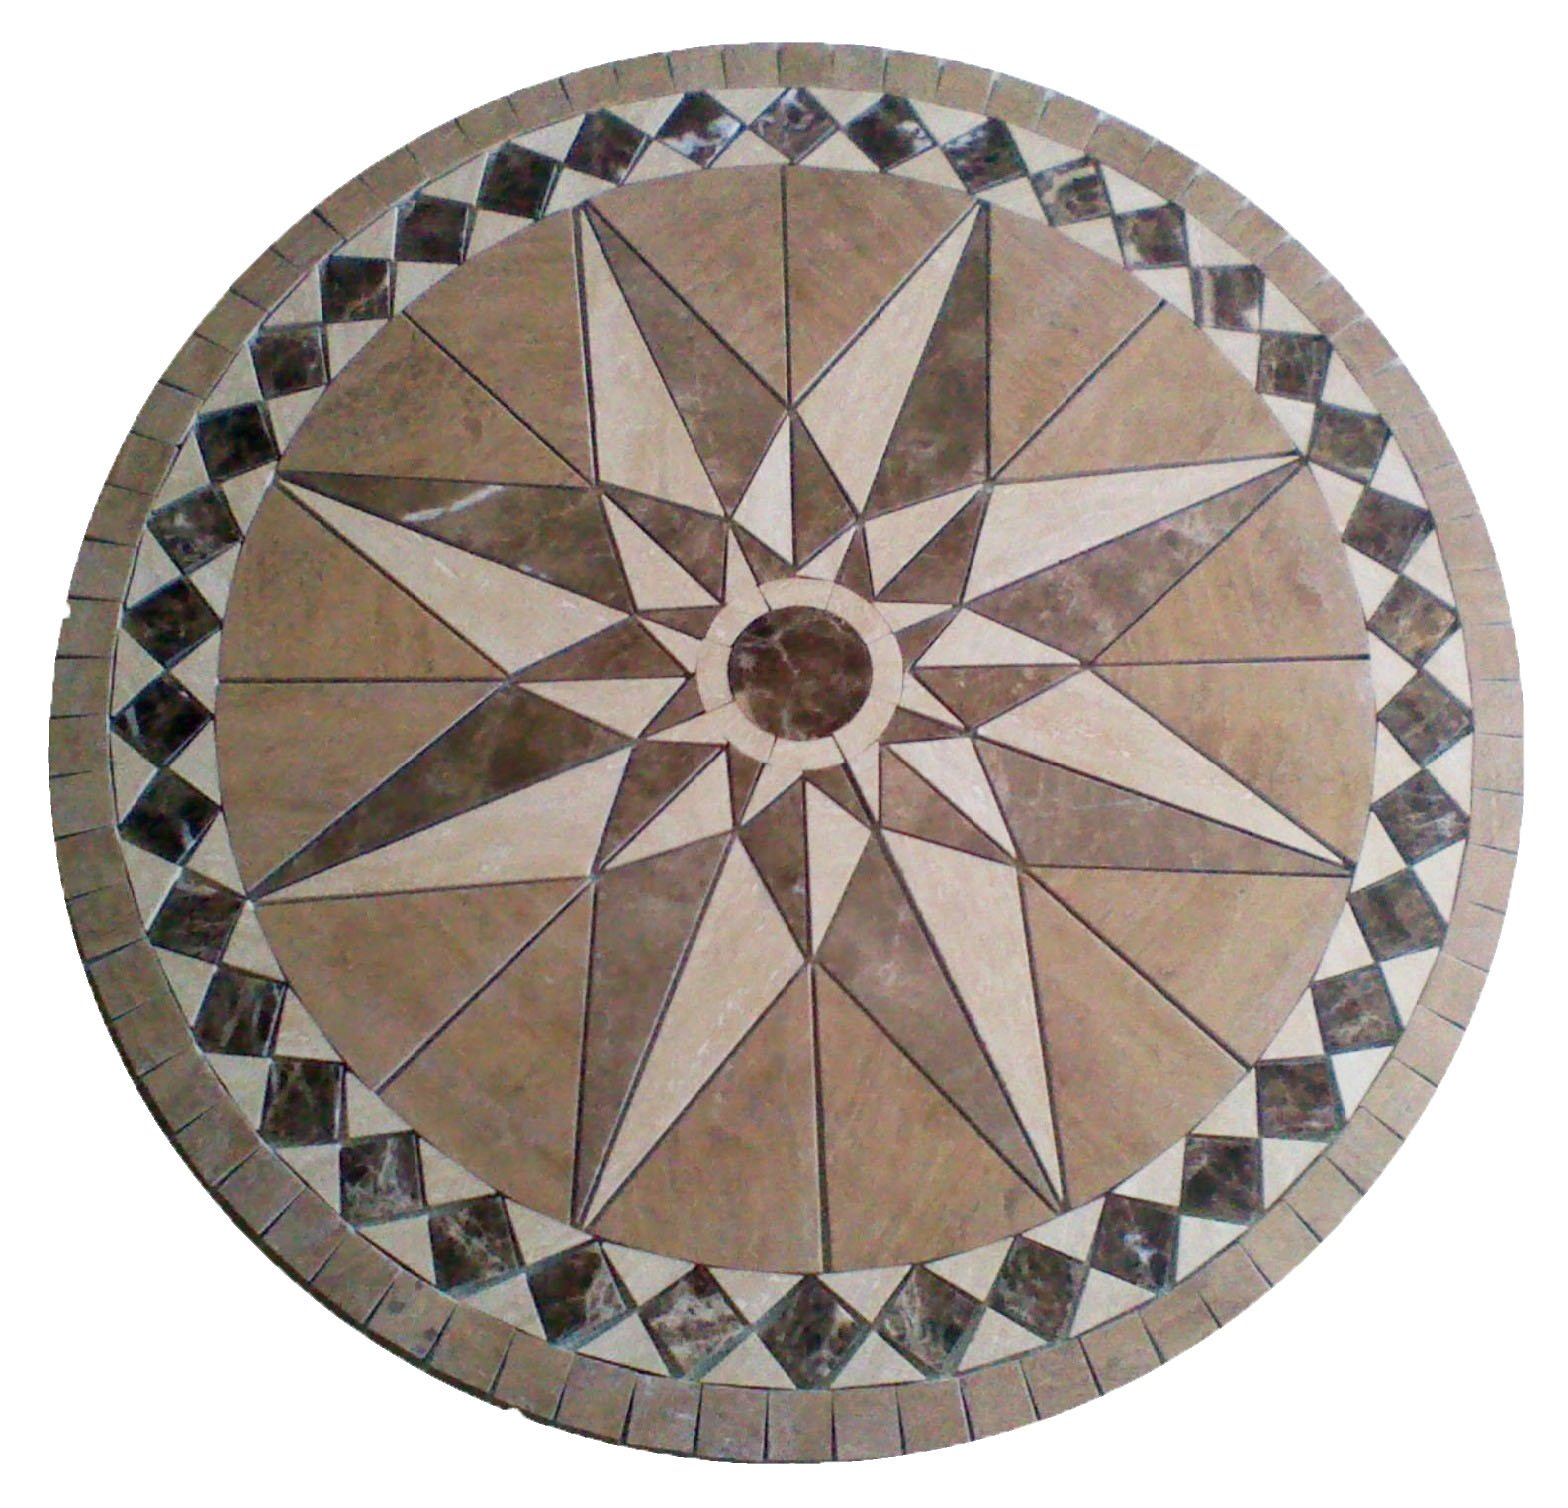 Tile Floor Medallion Marble Mosaic Travertine Star 36'' by MedallionUS